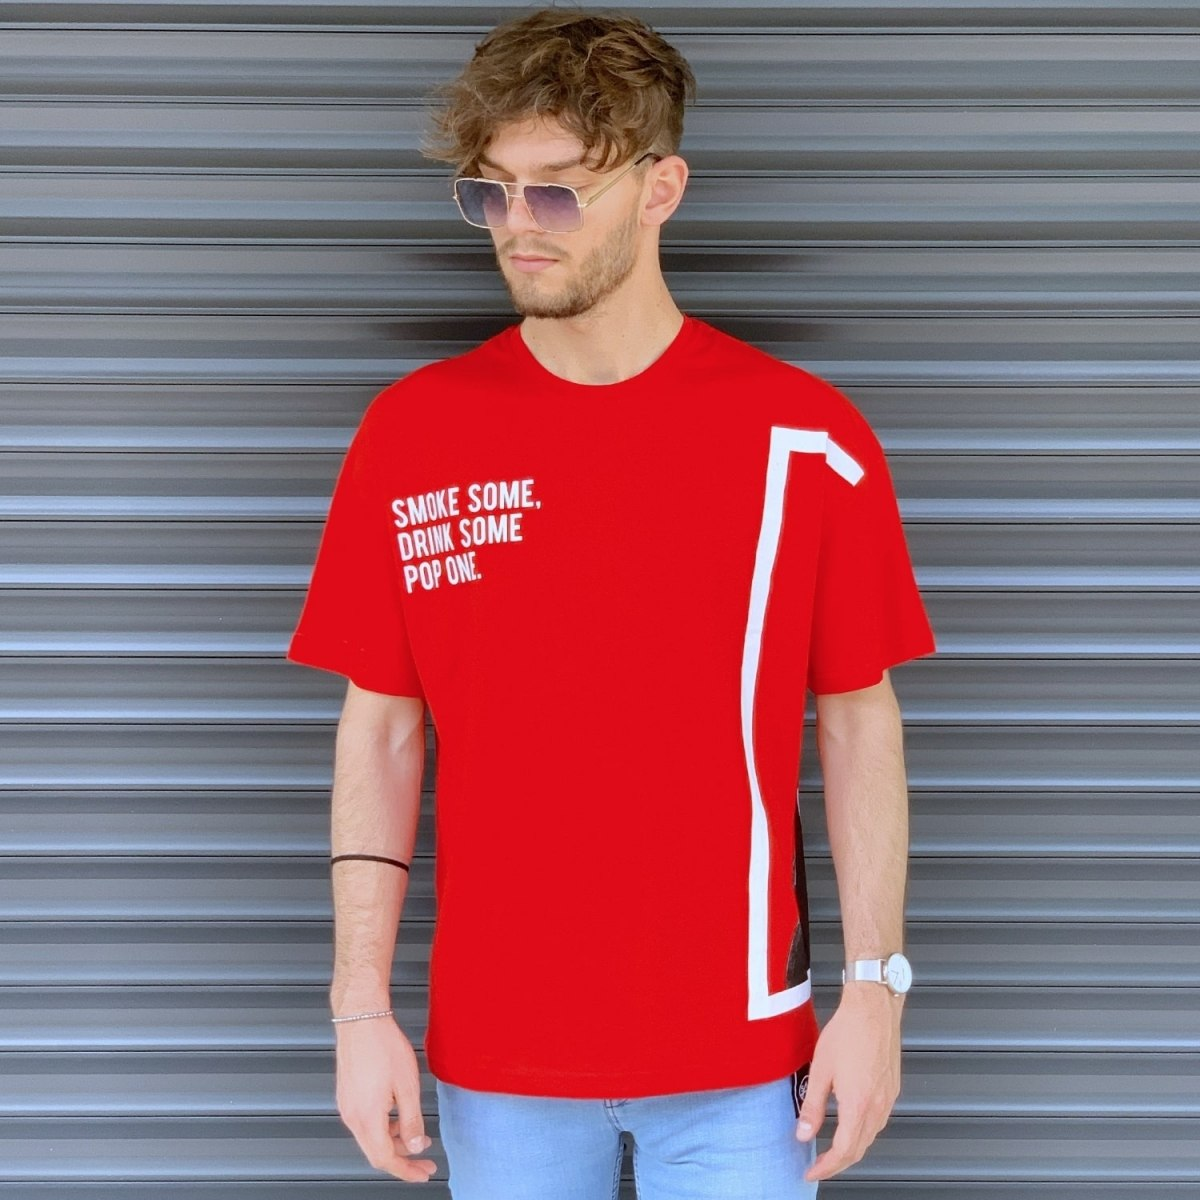 Men's Comfort Round Neck T-Shirt In Red Mv Premium Brand - 1